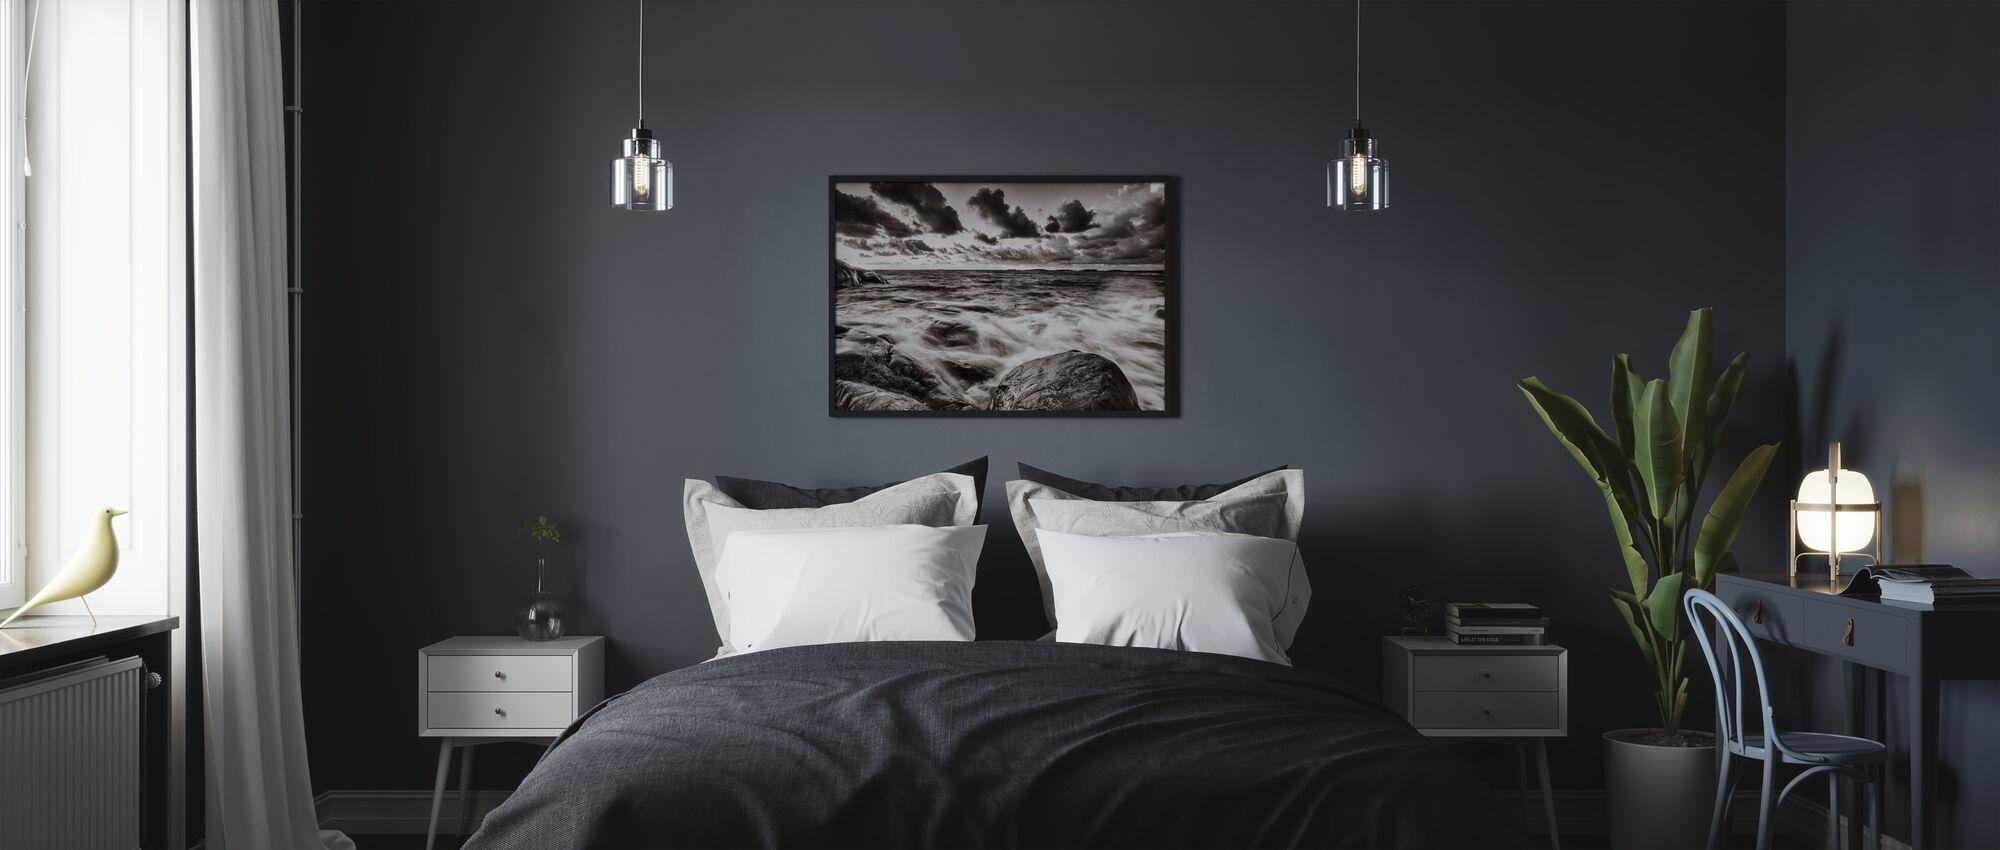 Stormy Sea at Rocks - Framed print - Bedroom